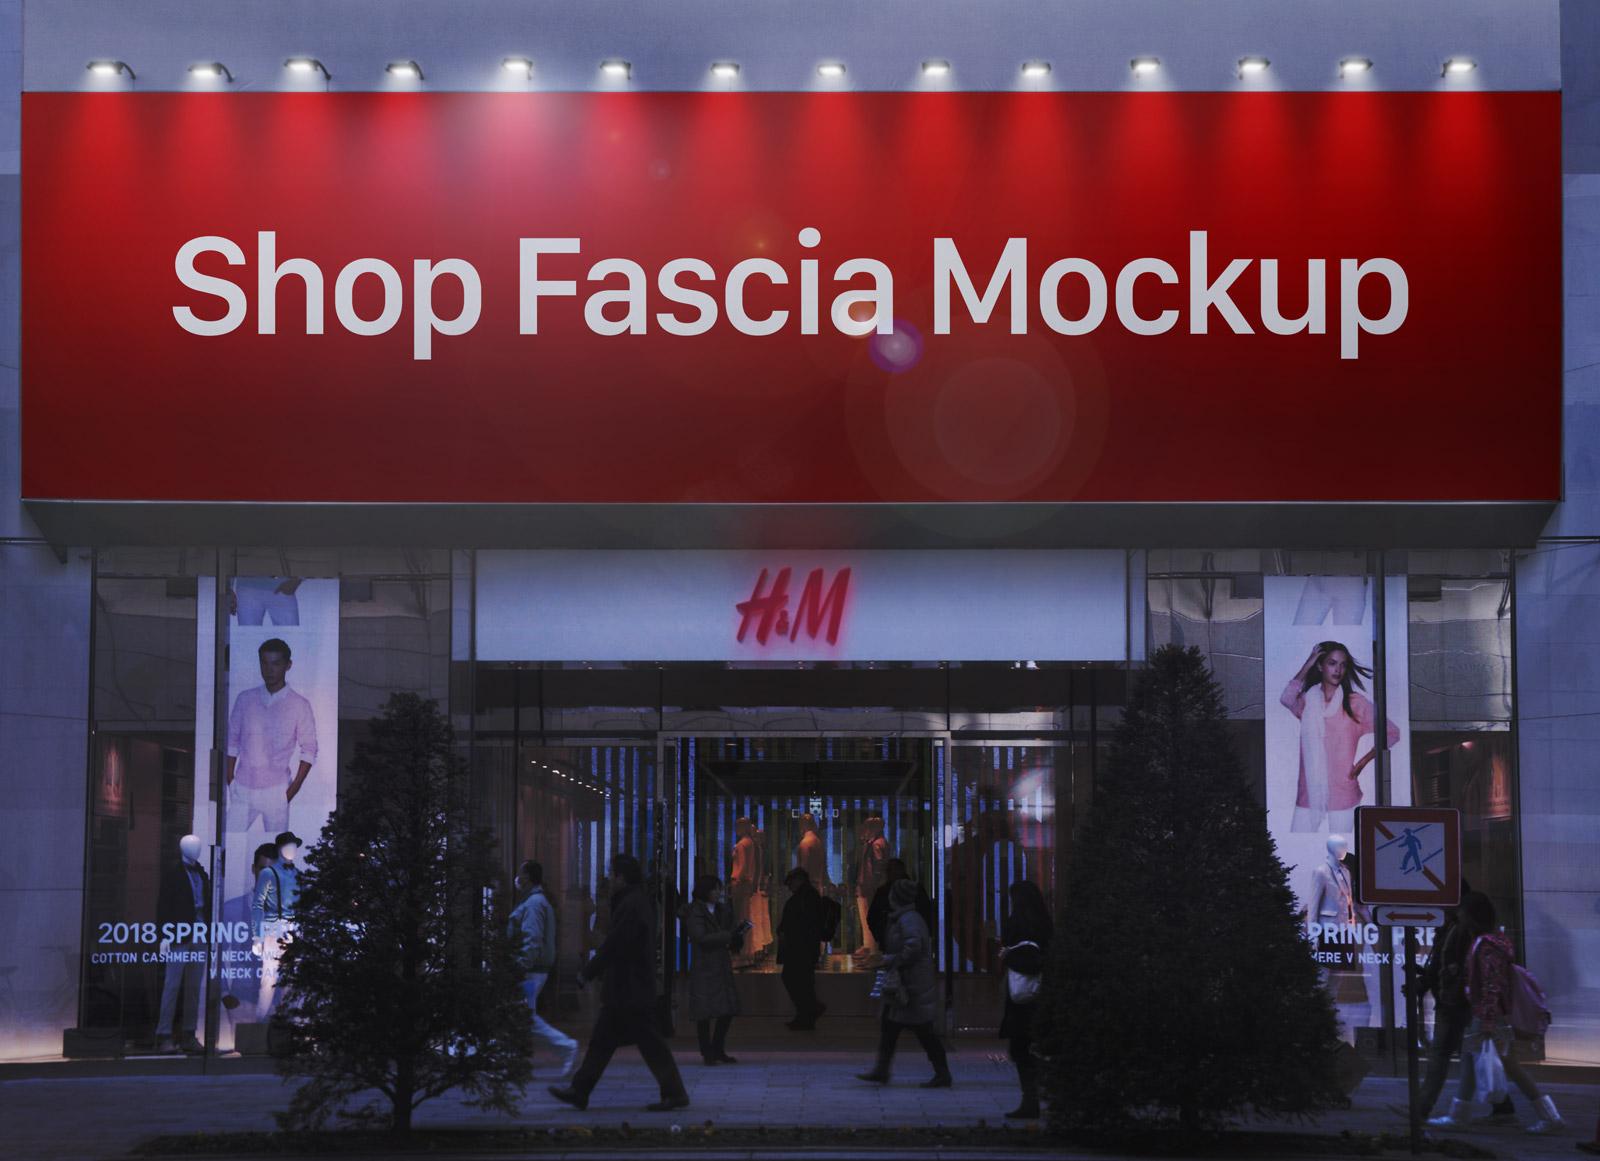 Free Wall Mounted Shop Fascia Billboard Mockup Psd Good